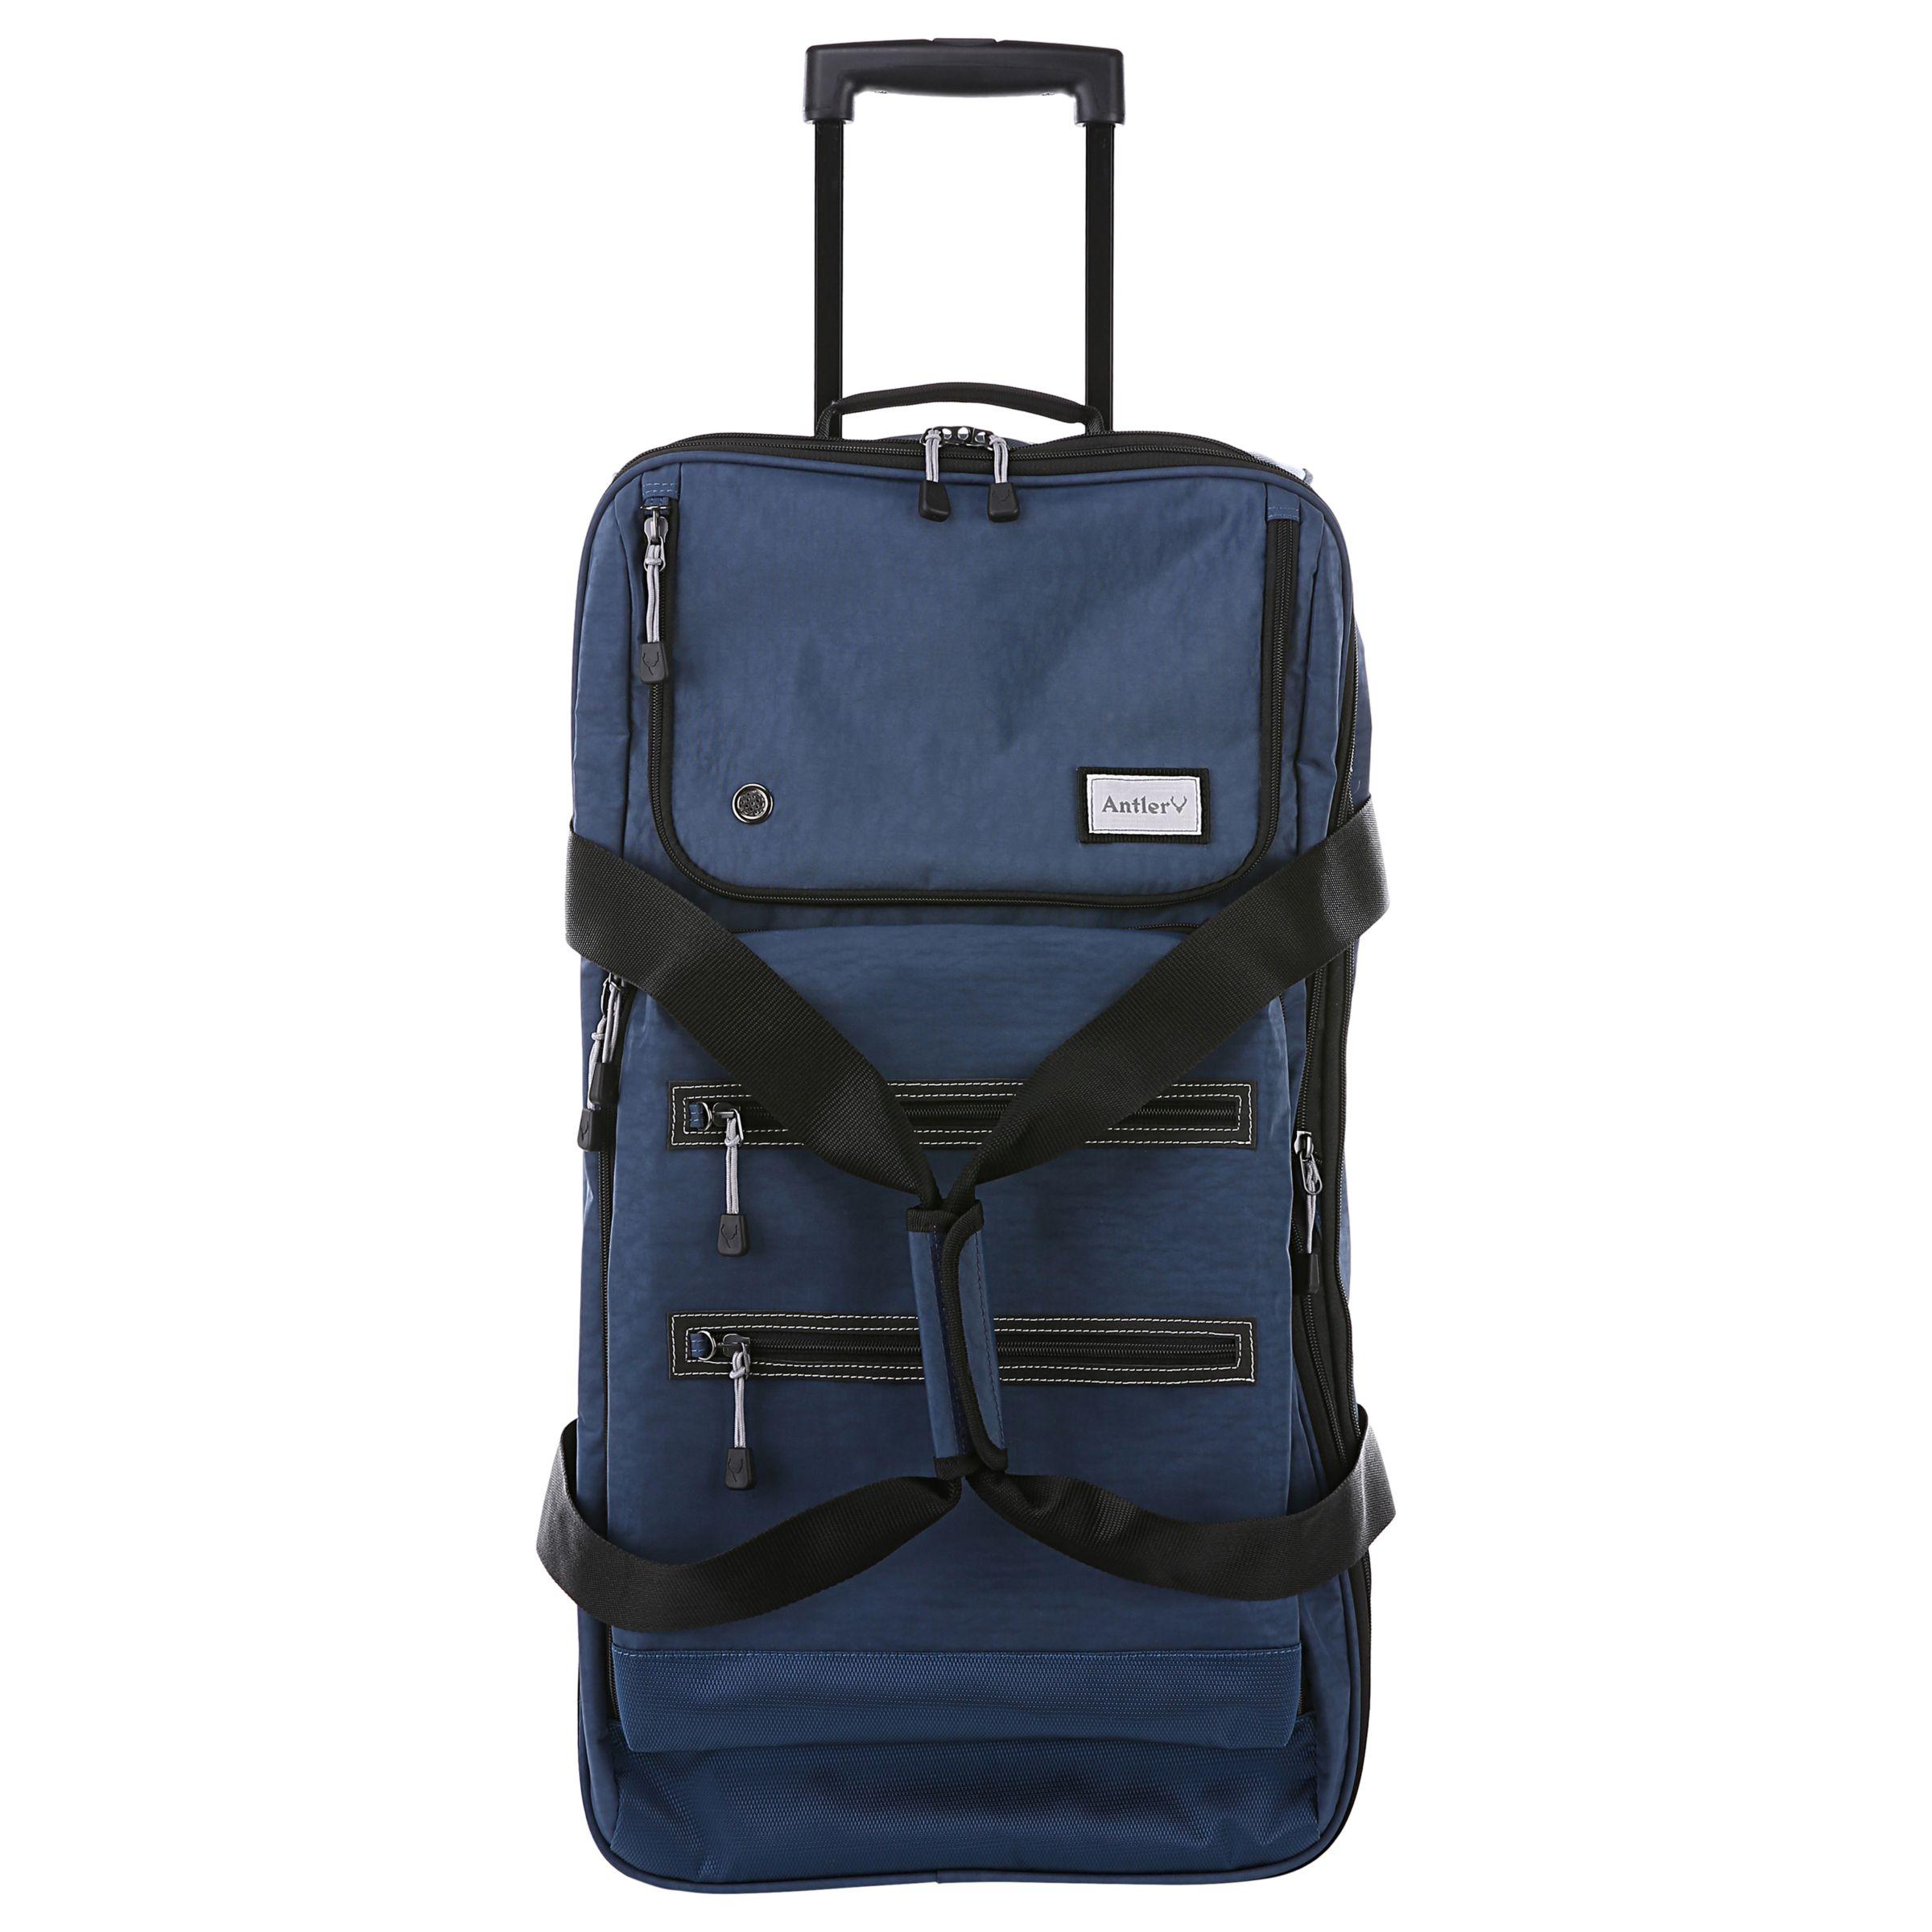 Antler Antler Urbanite Evolve 2-Wheel 71cm Large Upright Suitcase